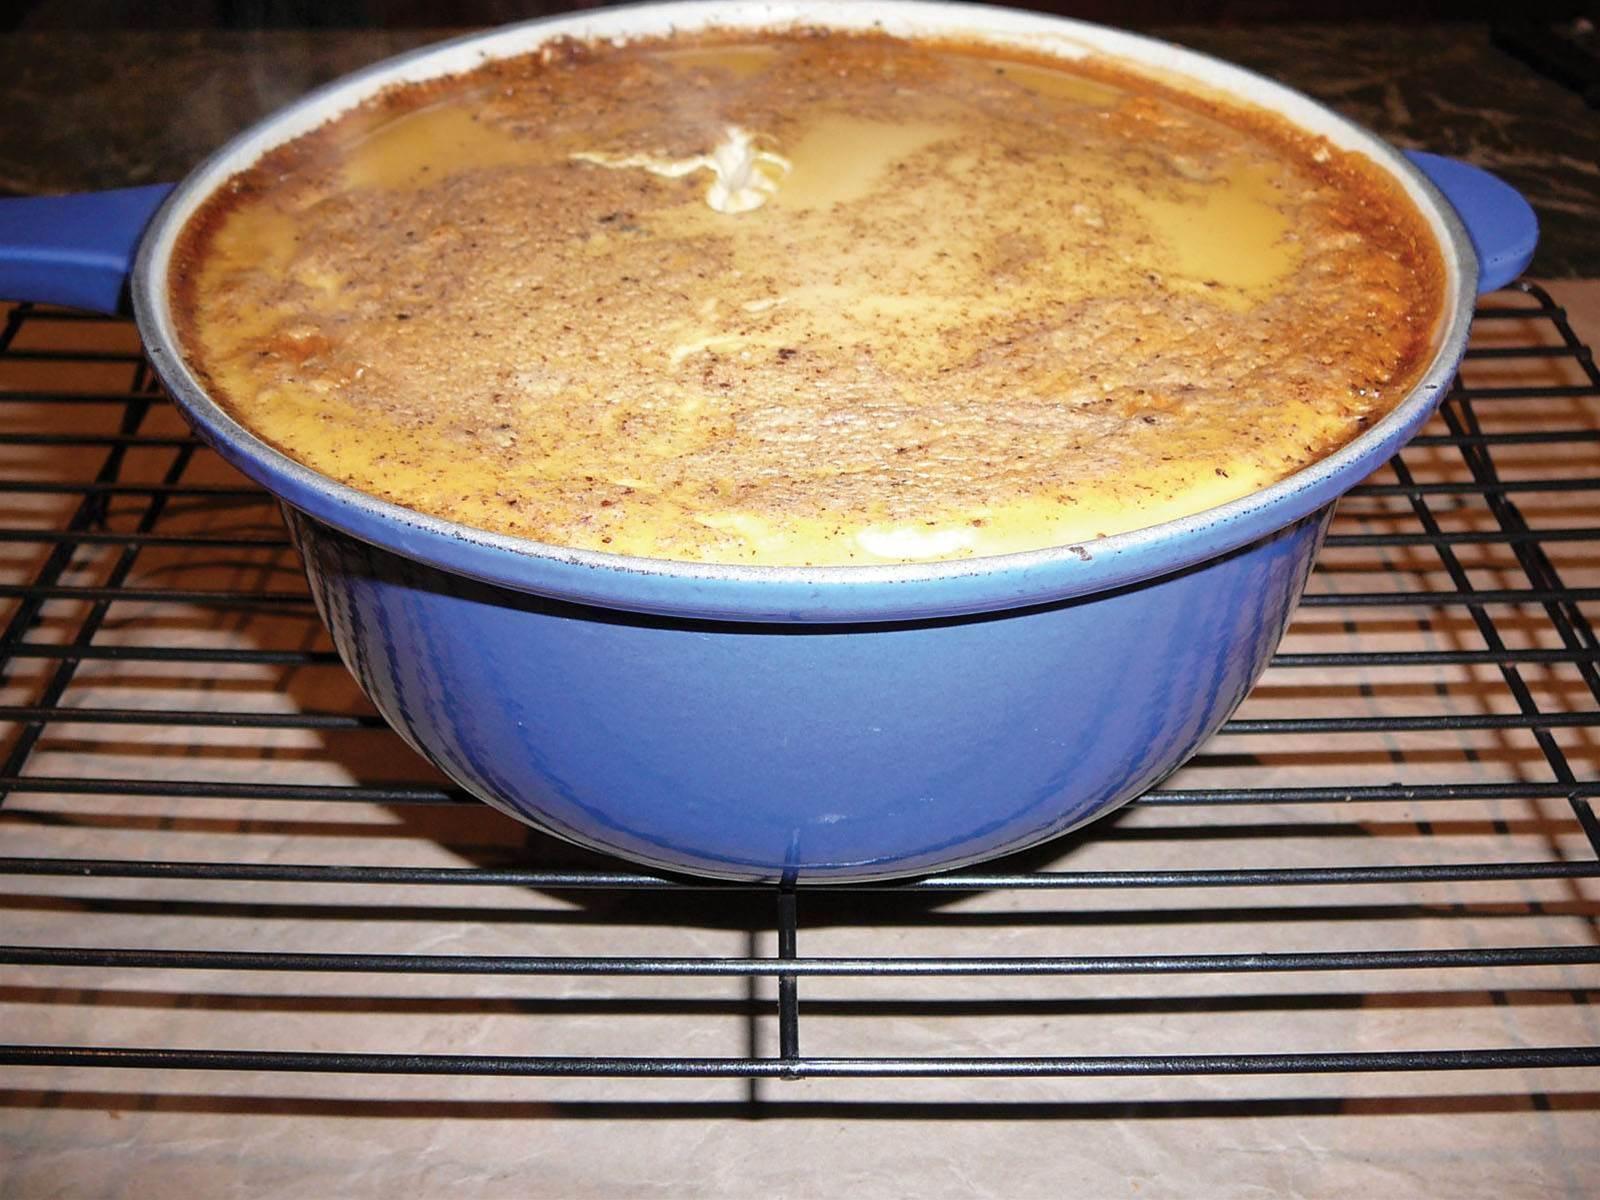 RECIPE: Caramel and pear baked rice custard